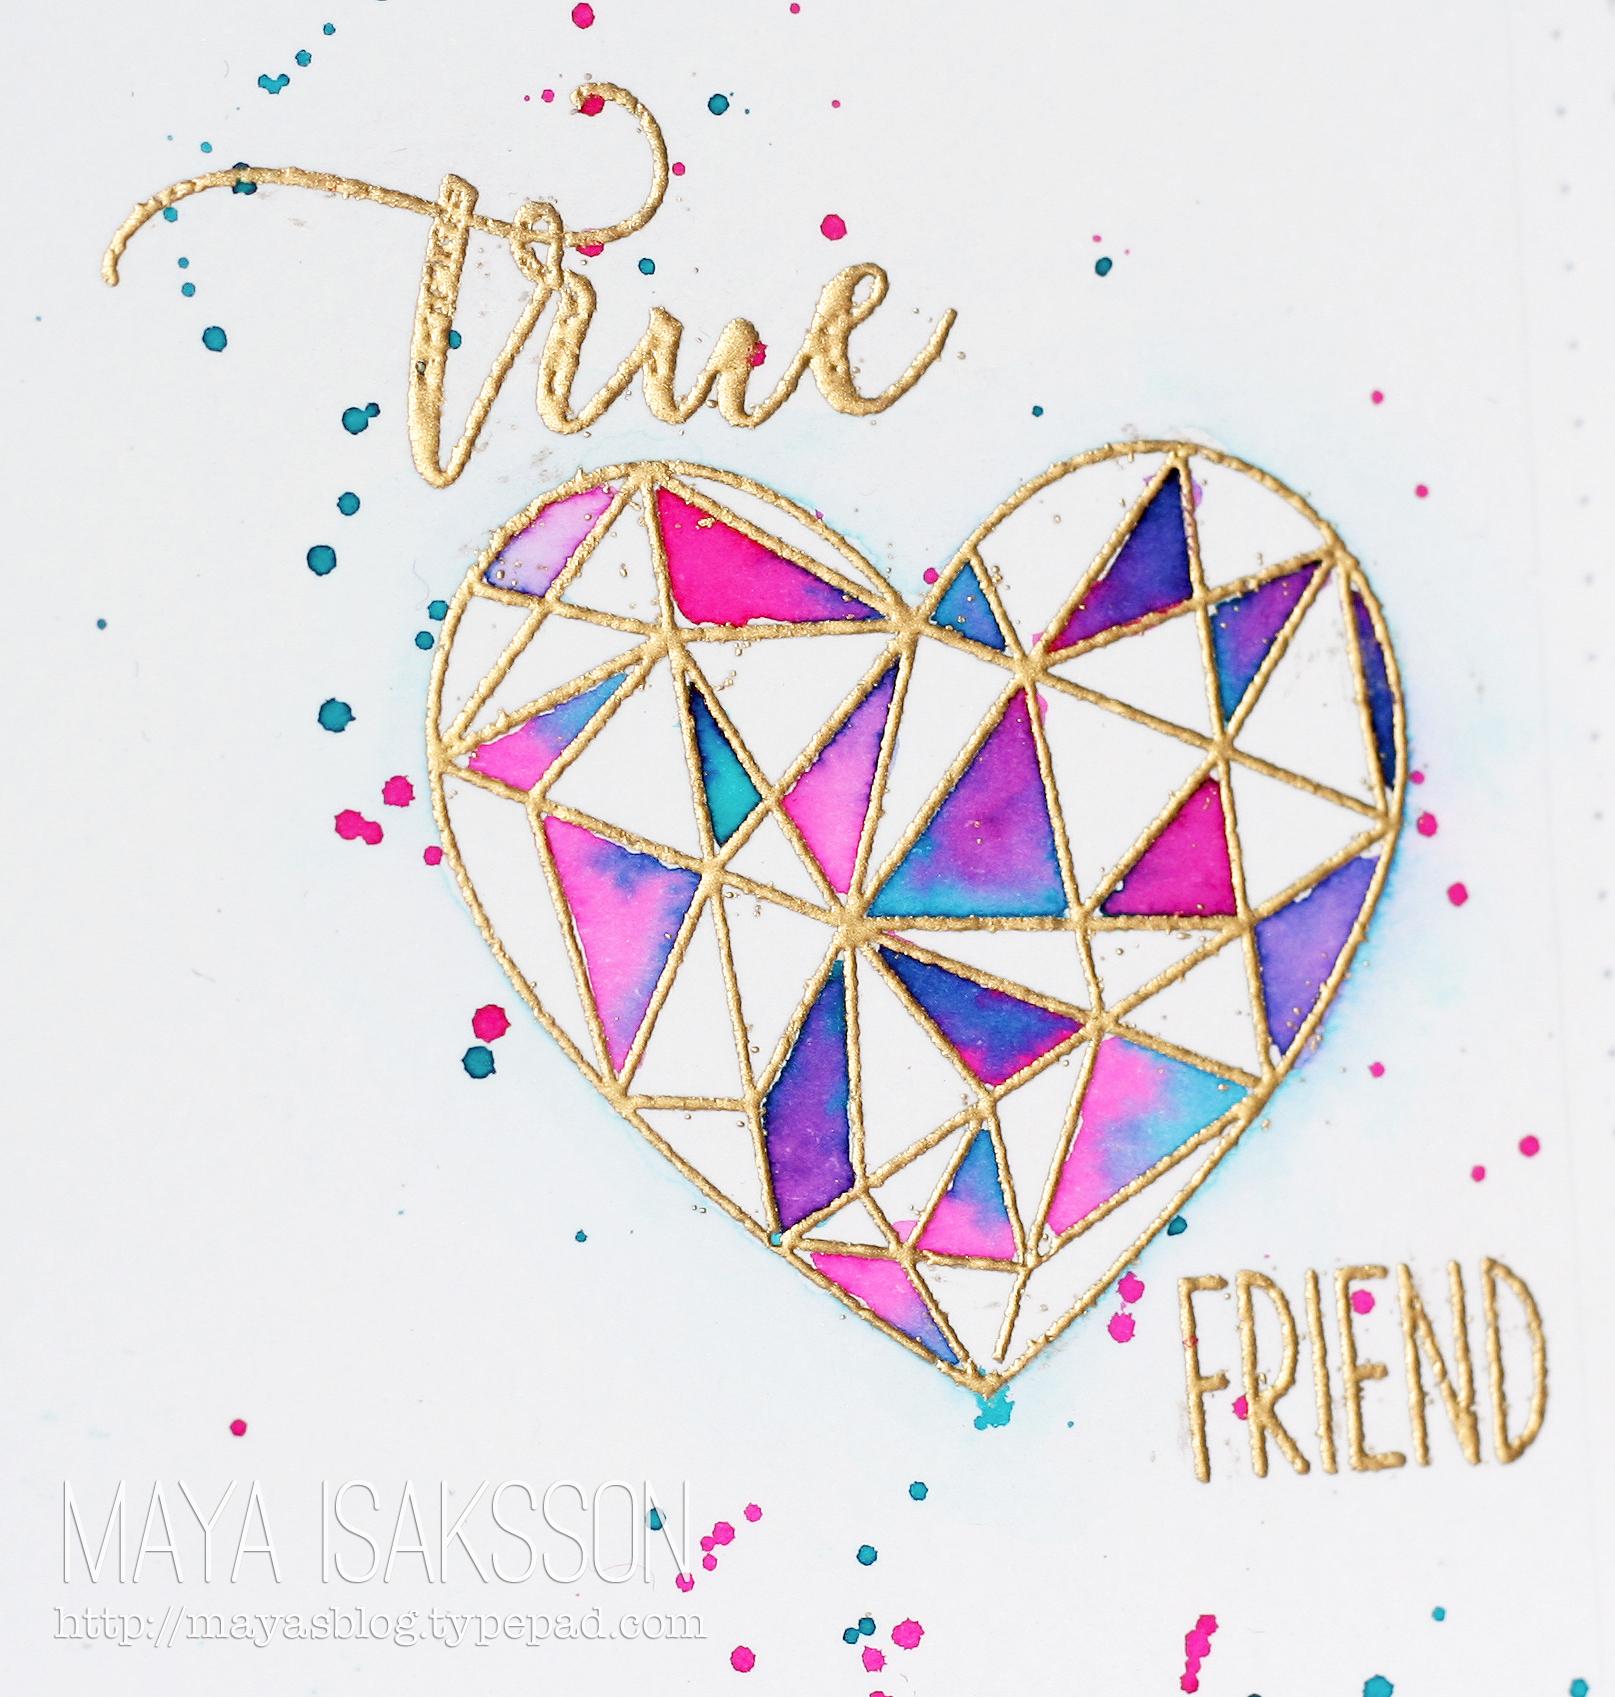 True_friend_winnie_walter